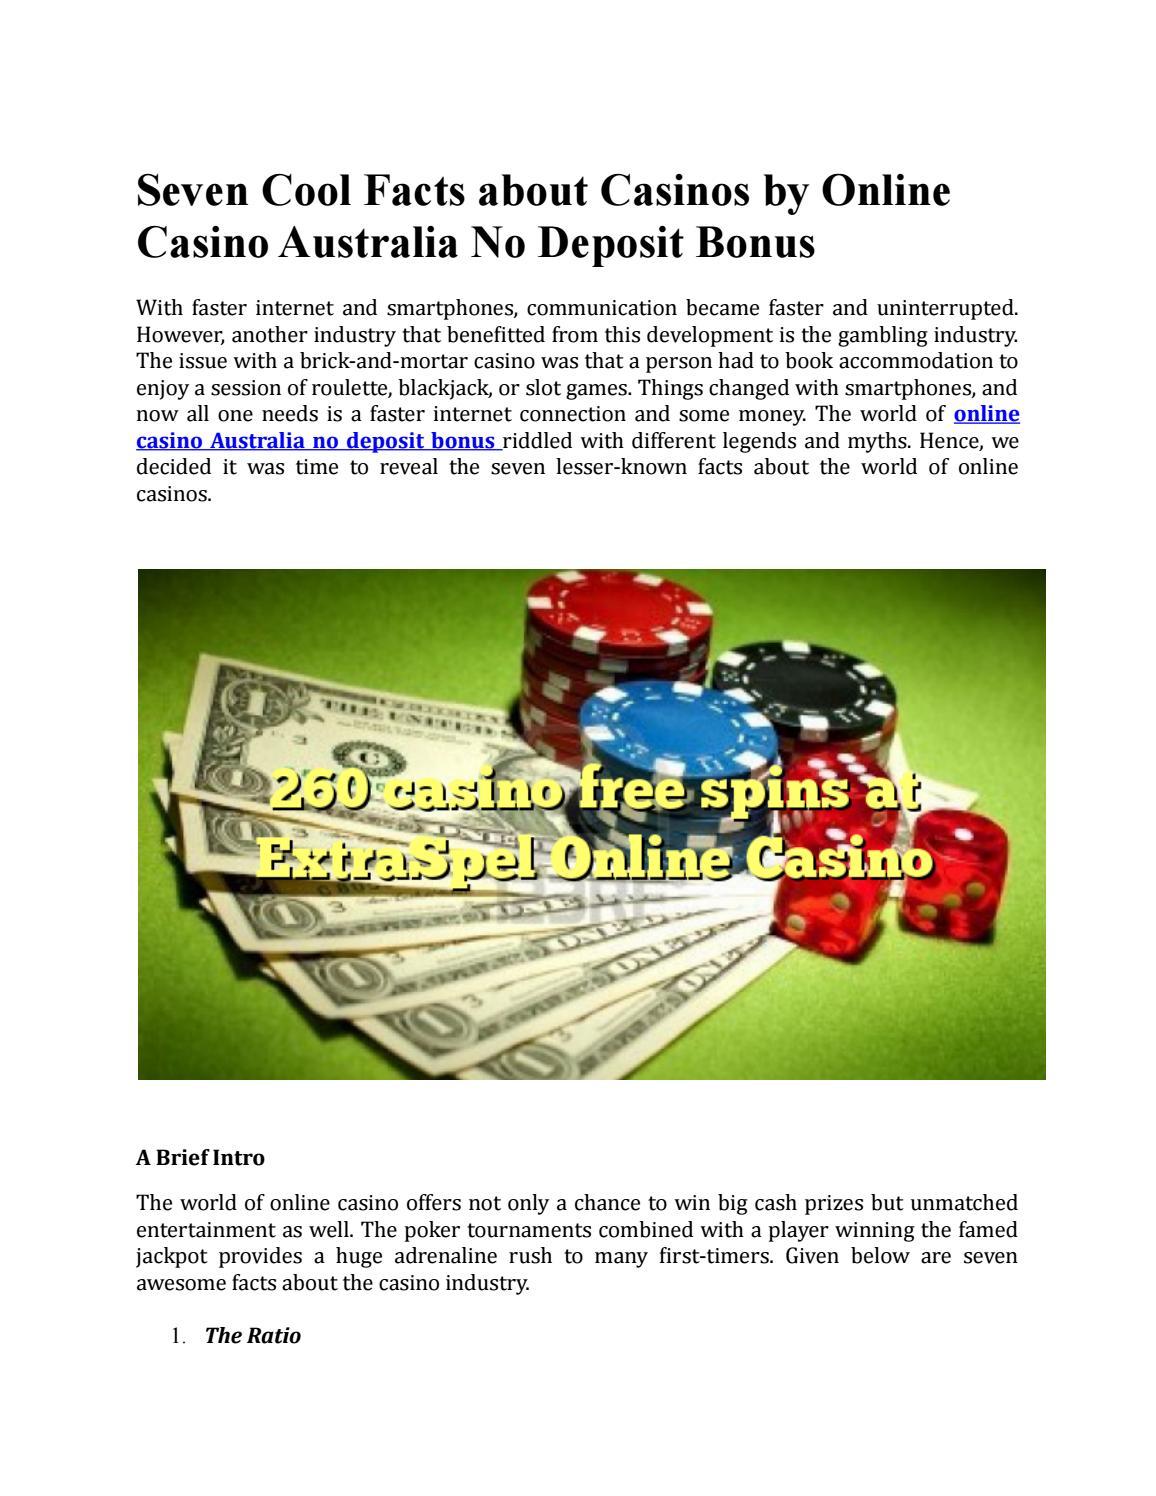 Free online mobile casino slots